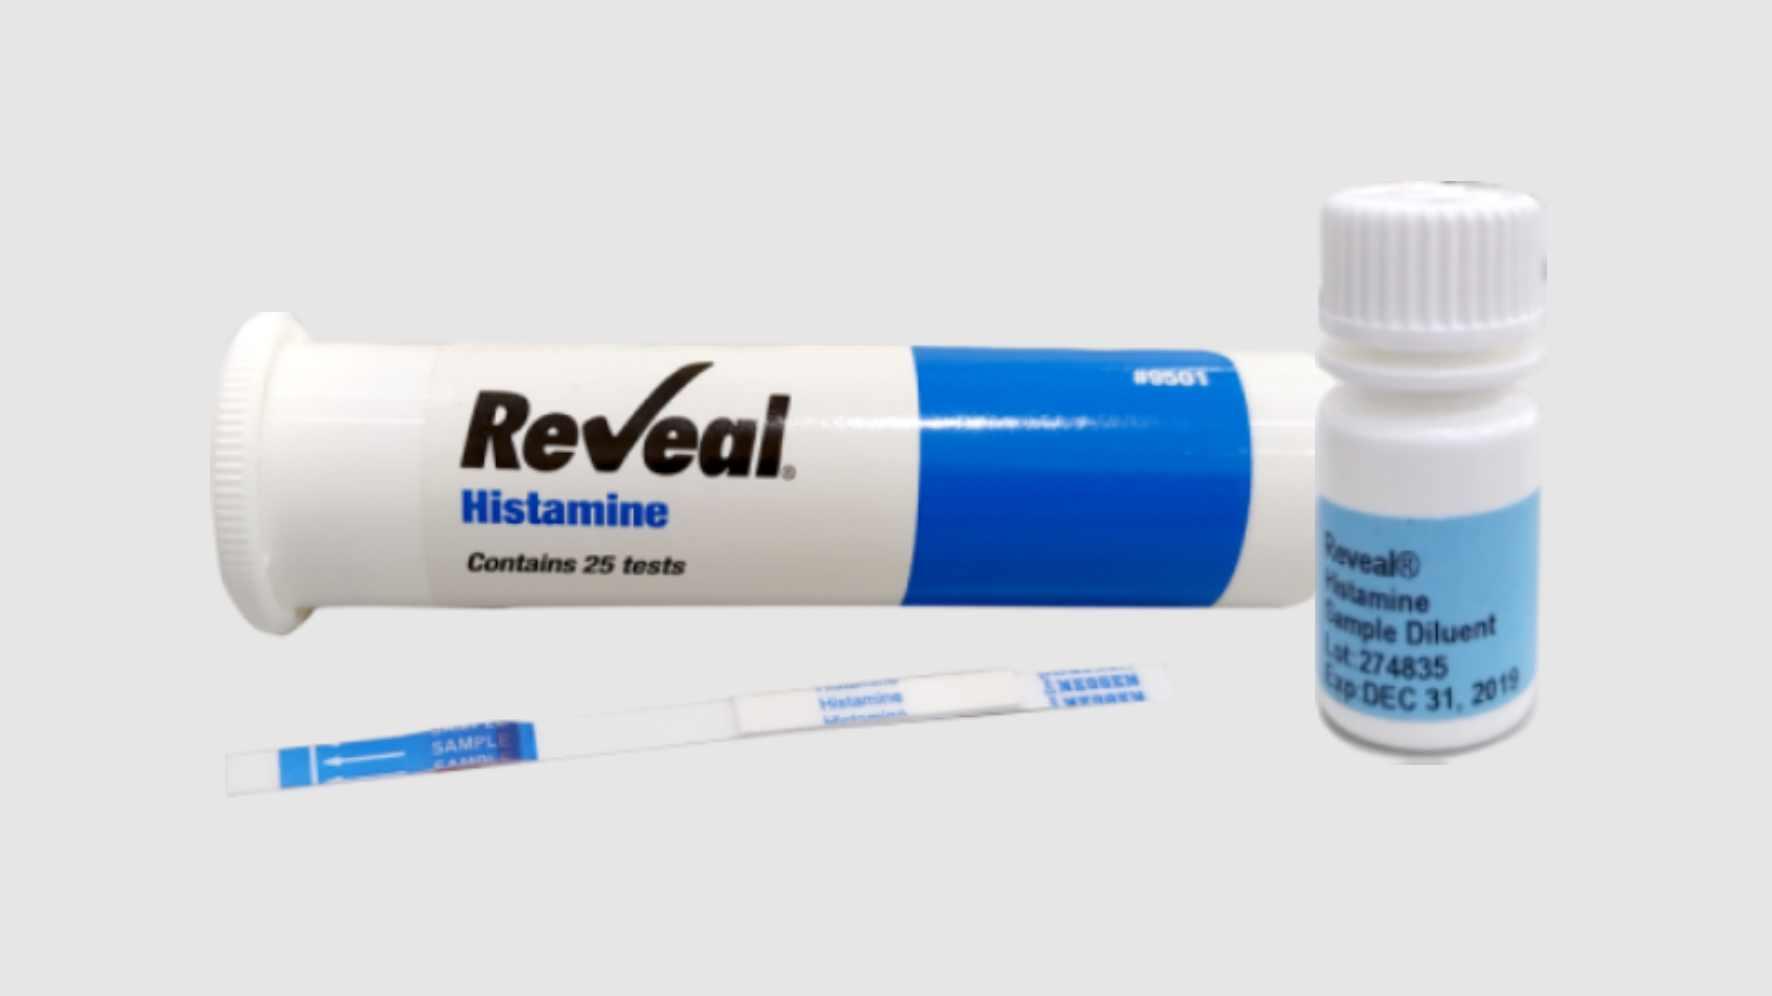 Jual Reveal Histamine